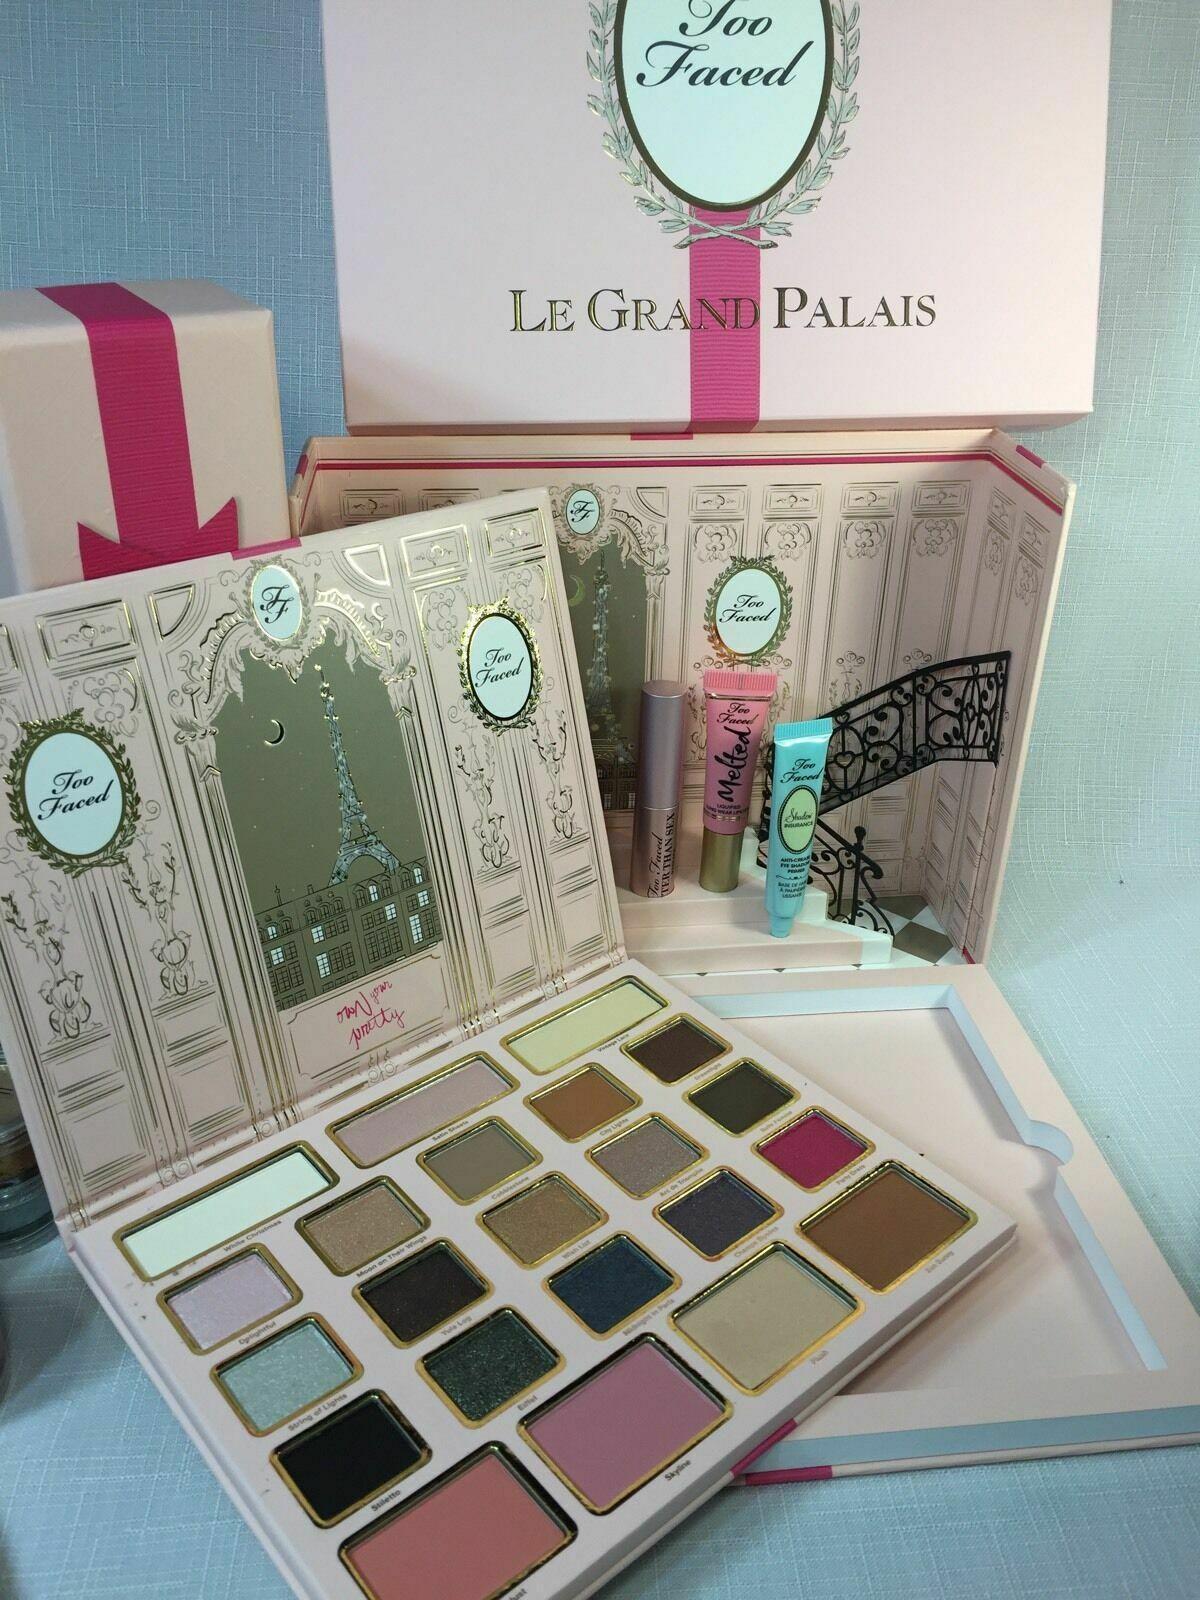 BNIB Too Faced LE Grand Palais Eyeshadow Palette Holiday  w/receipt - $85.49